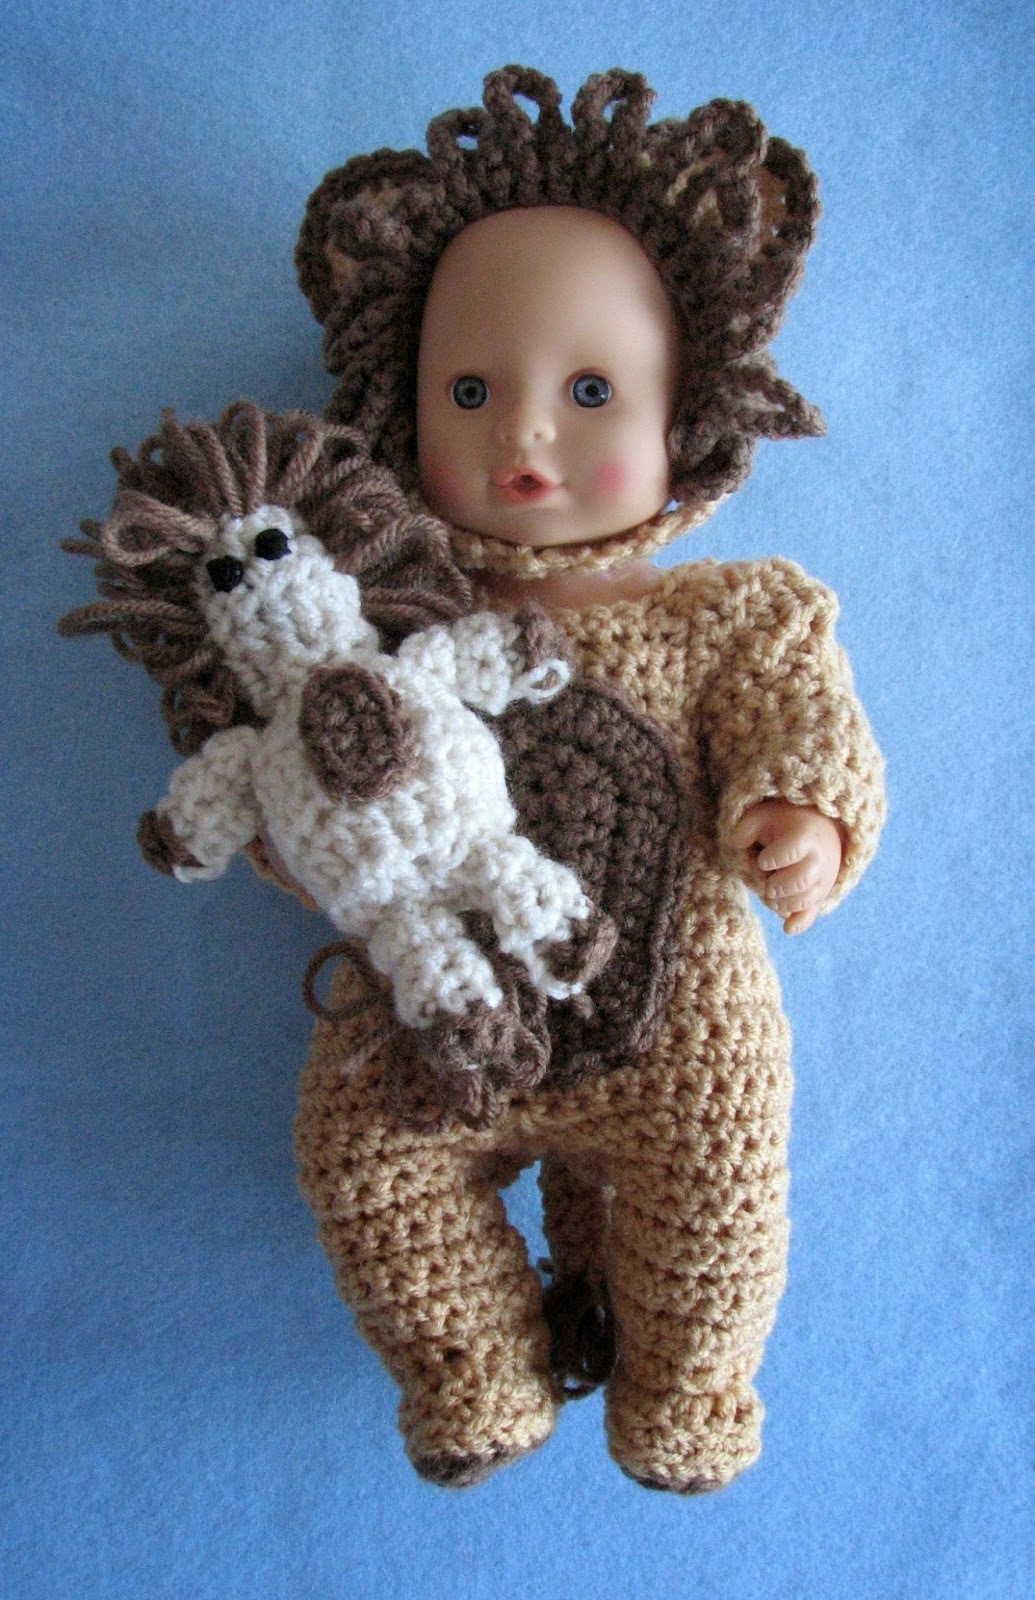 Donnas Crochet Designs Blog of Free Patterns: Free ...